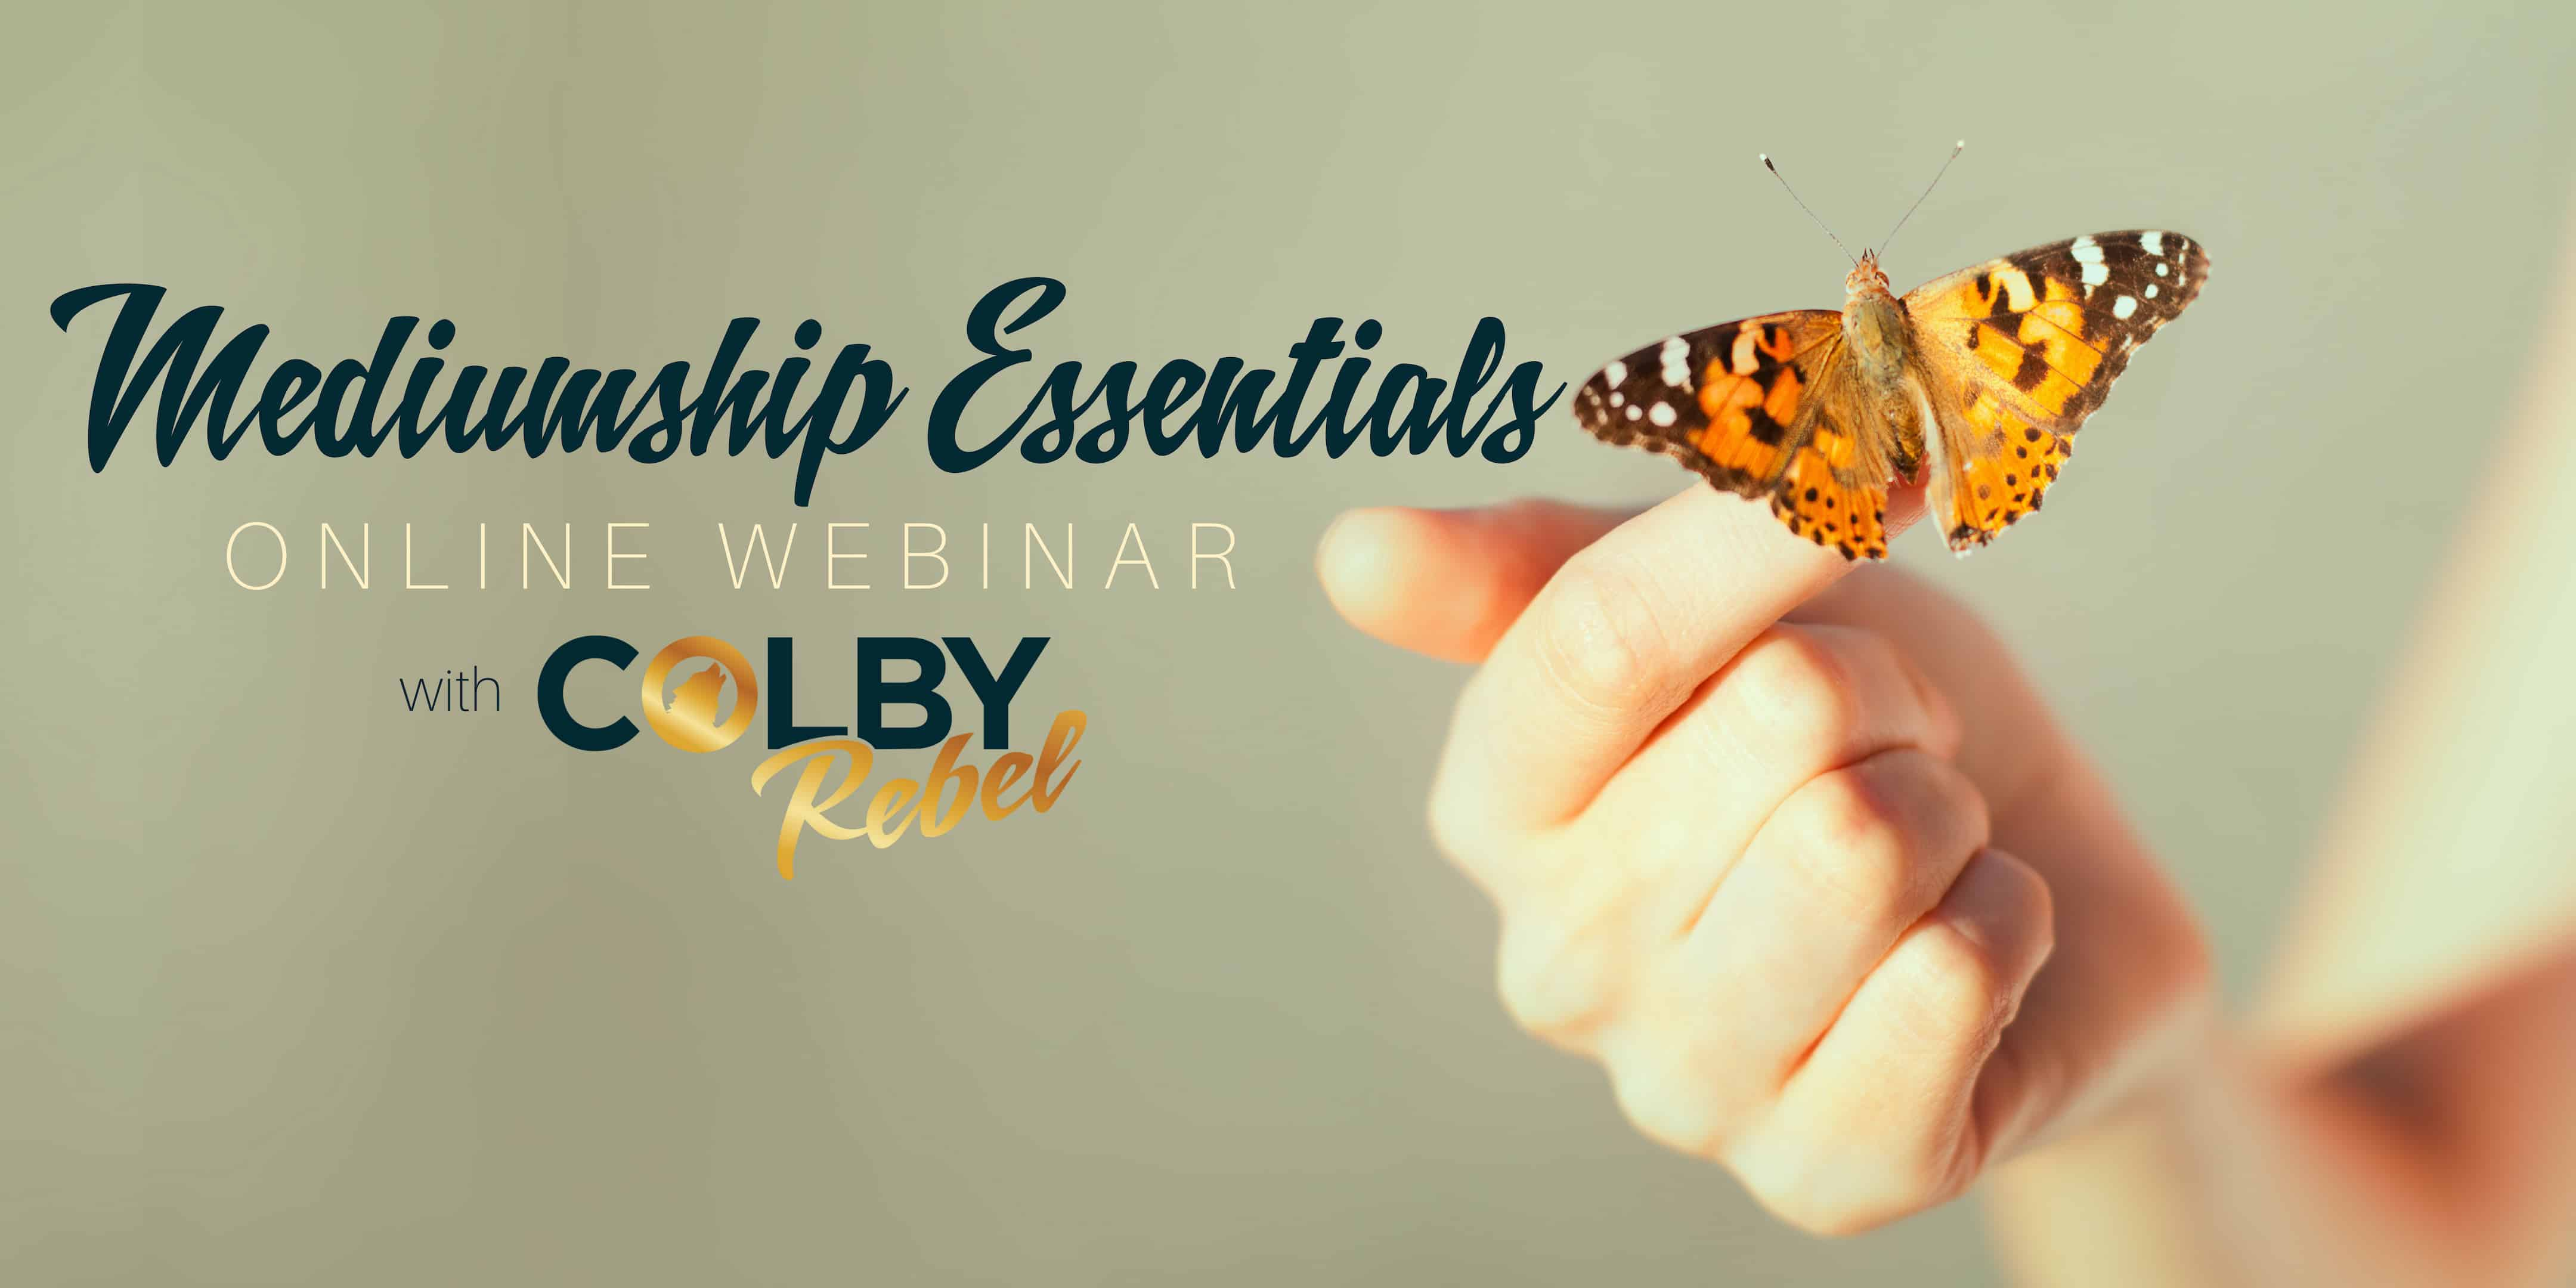 Mediumship Essentials Online Class